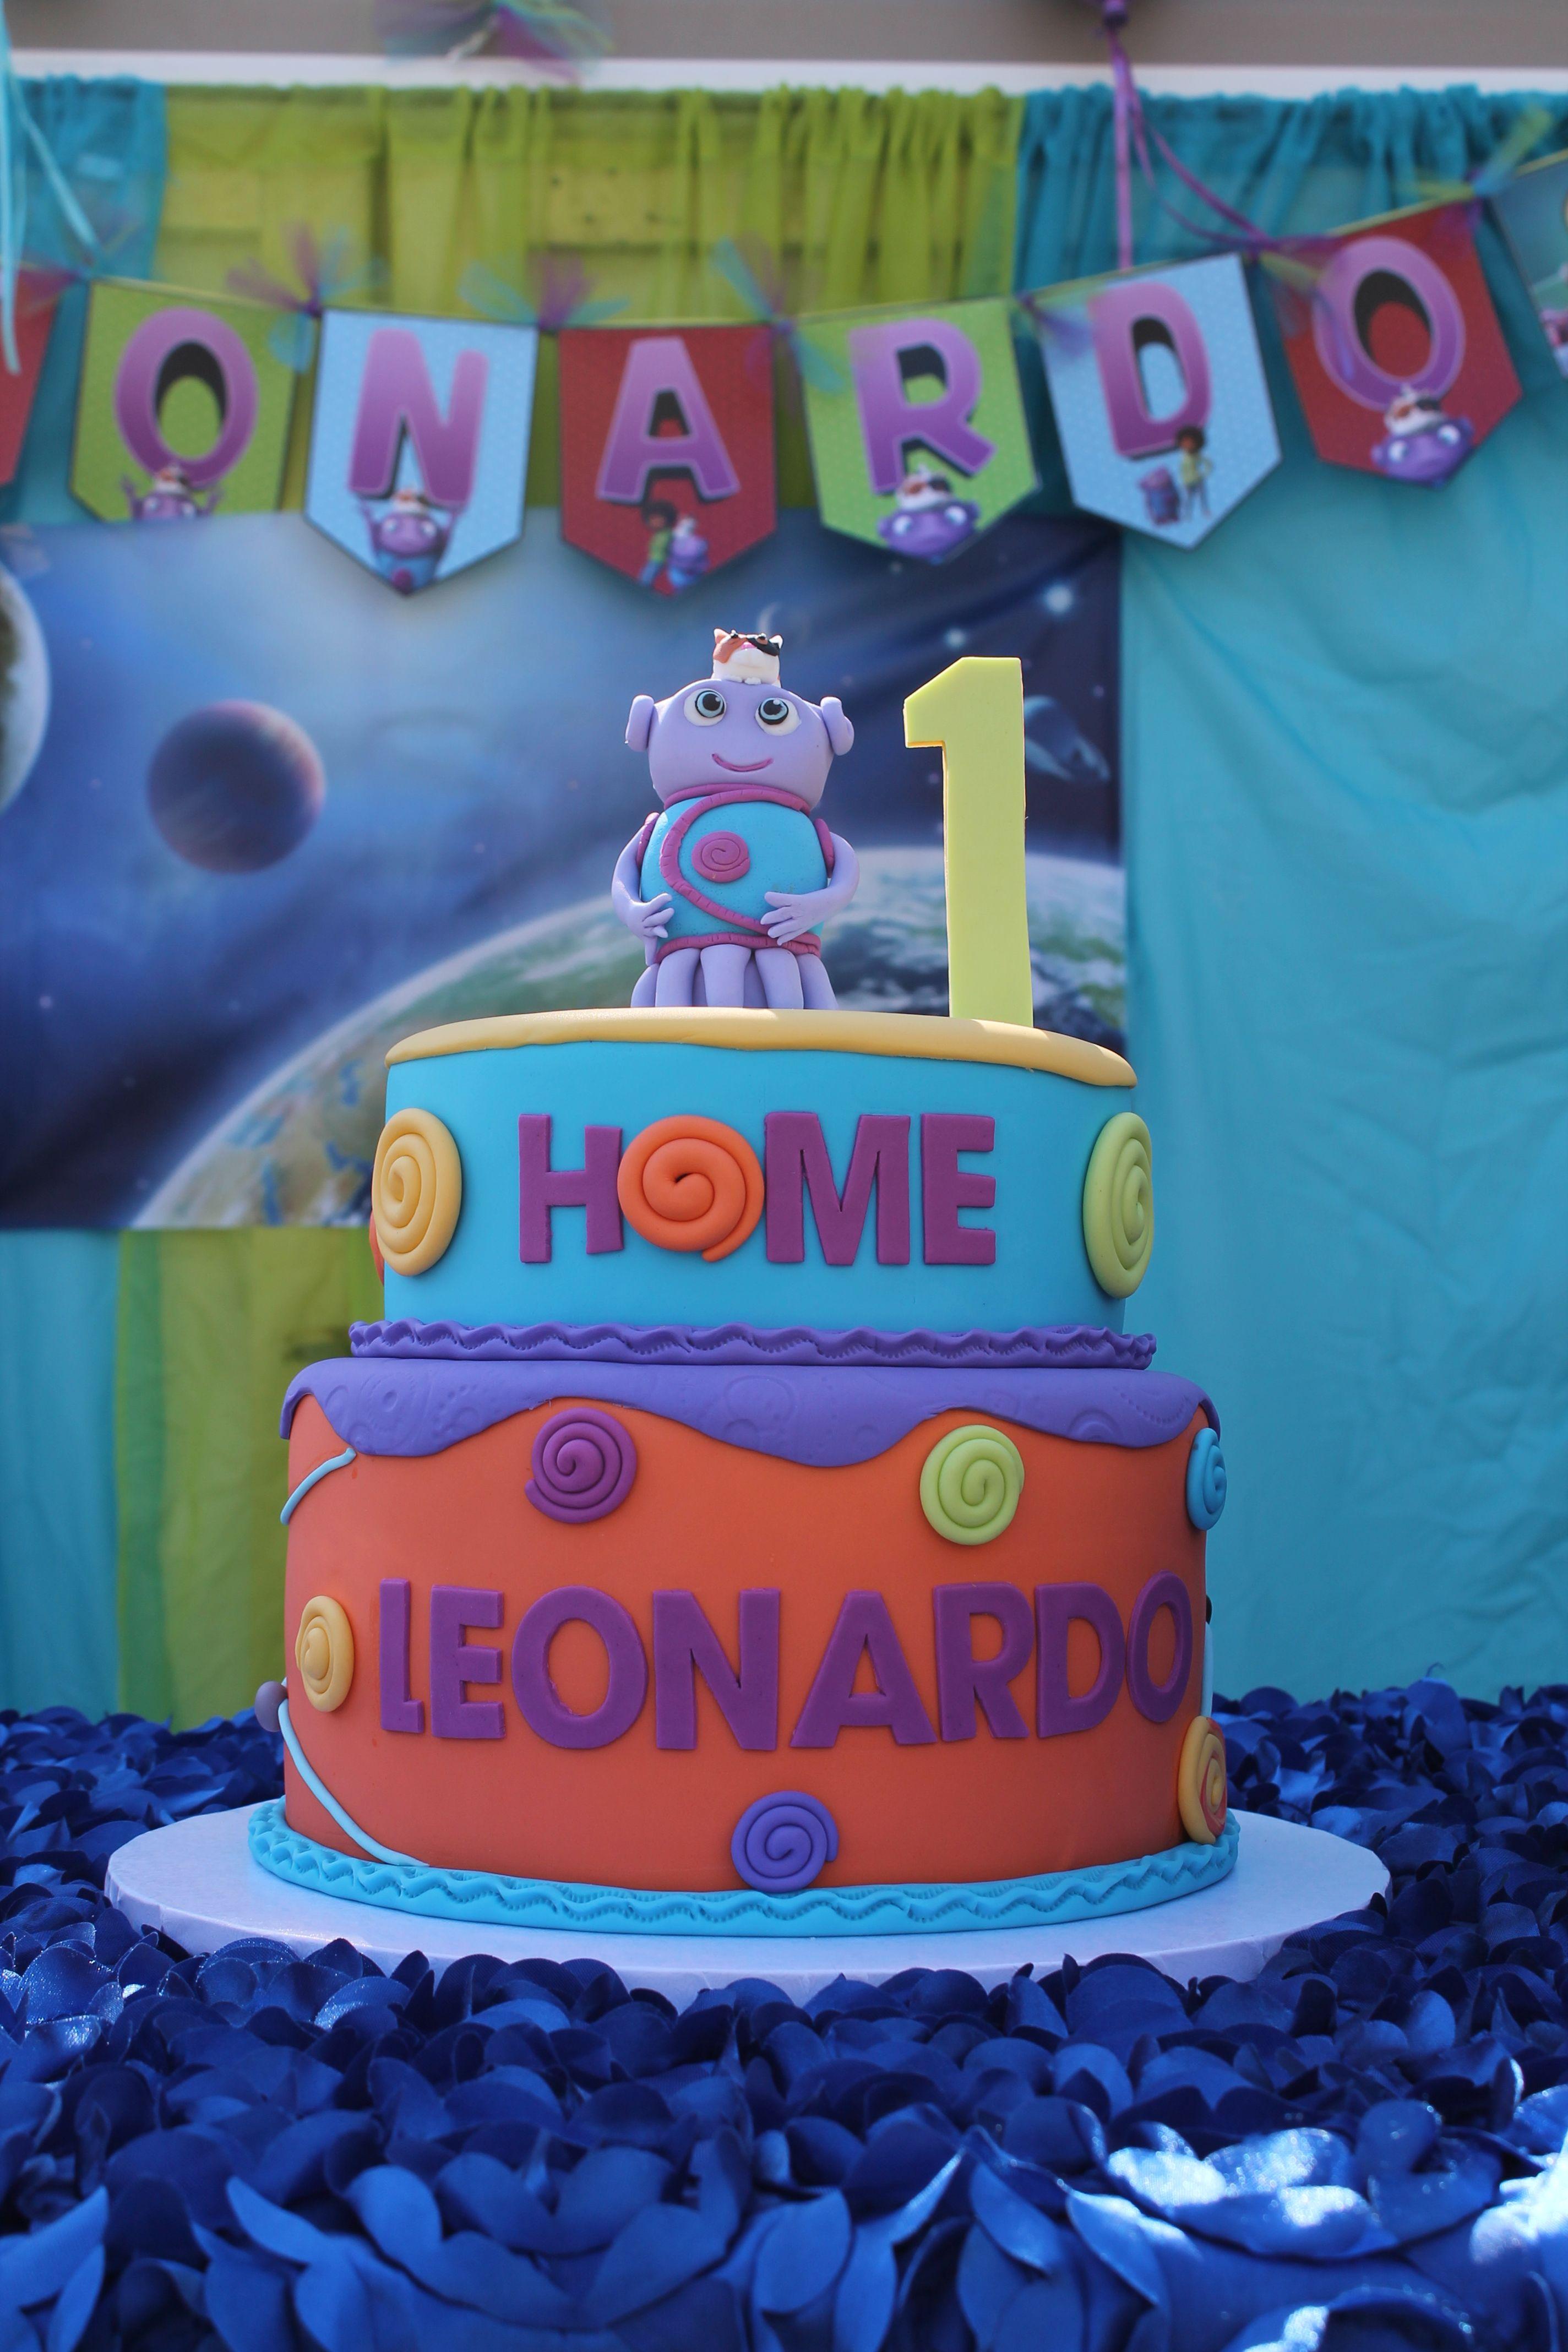 Boov Cake With Solar System Background From The Movie Home Leonardo